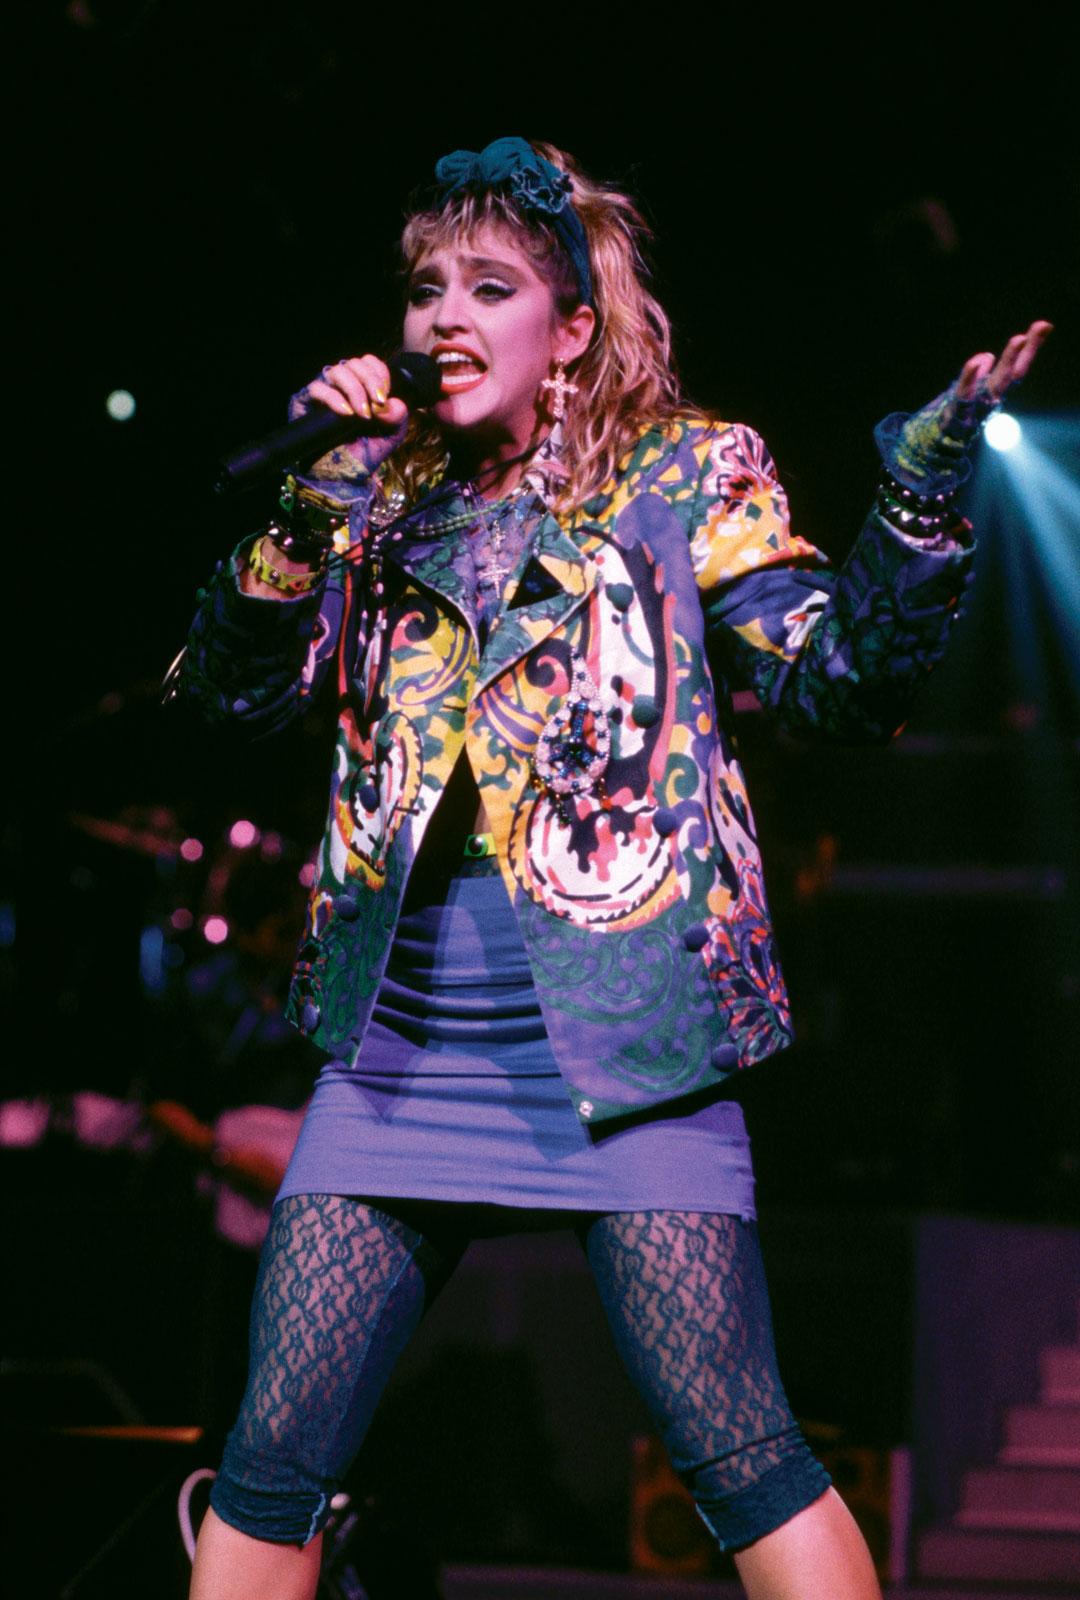 madonna 1985 virgin tour - photo #20